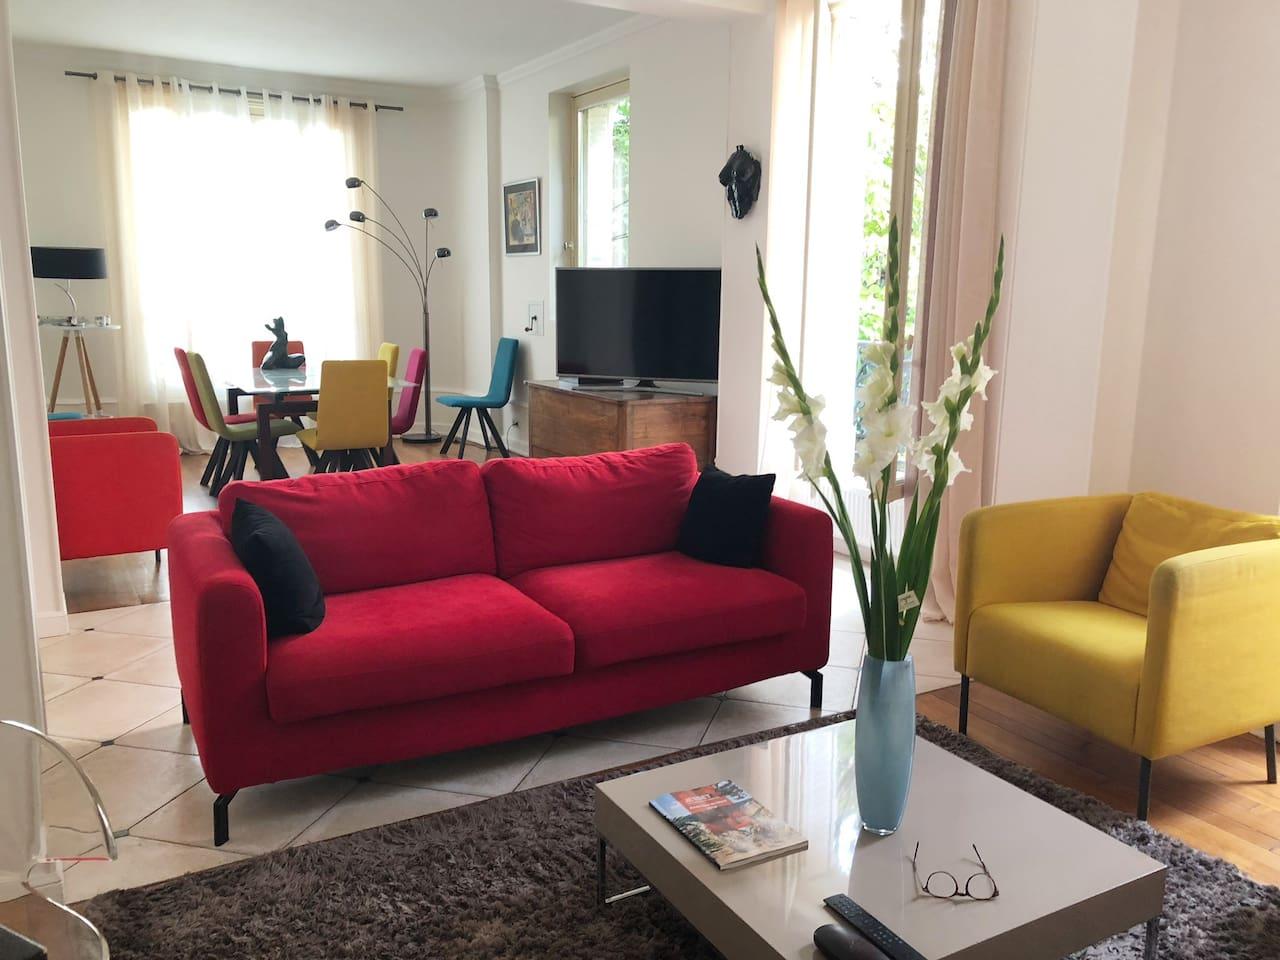 Grand salon séjour de 50 m2